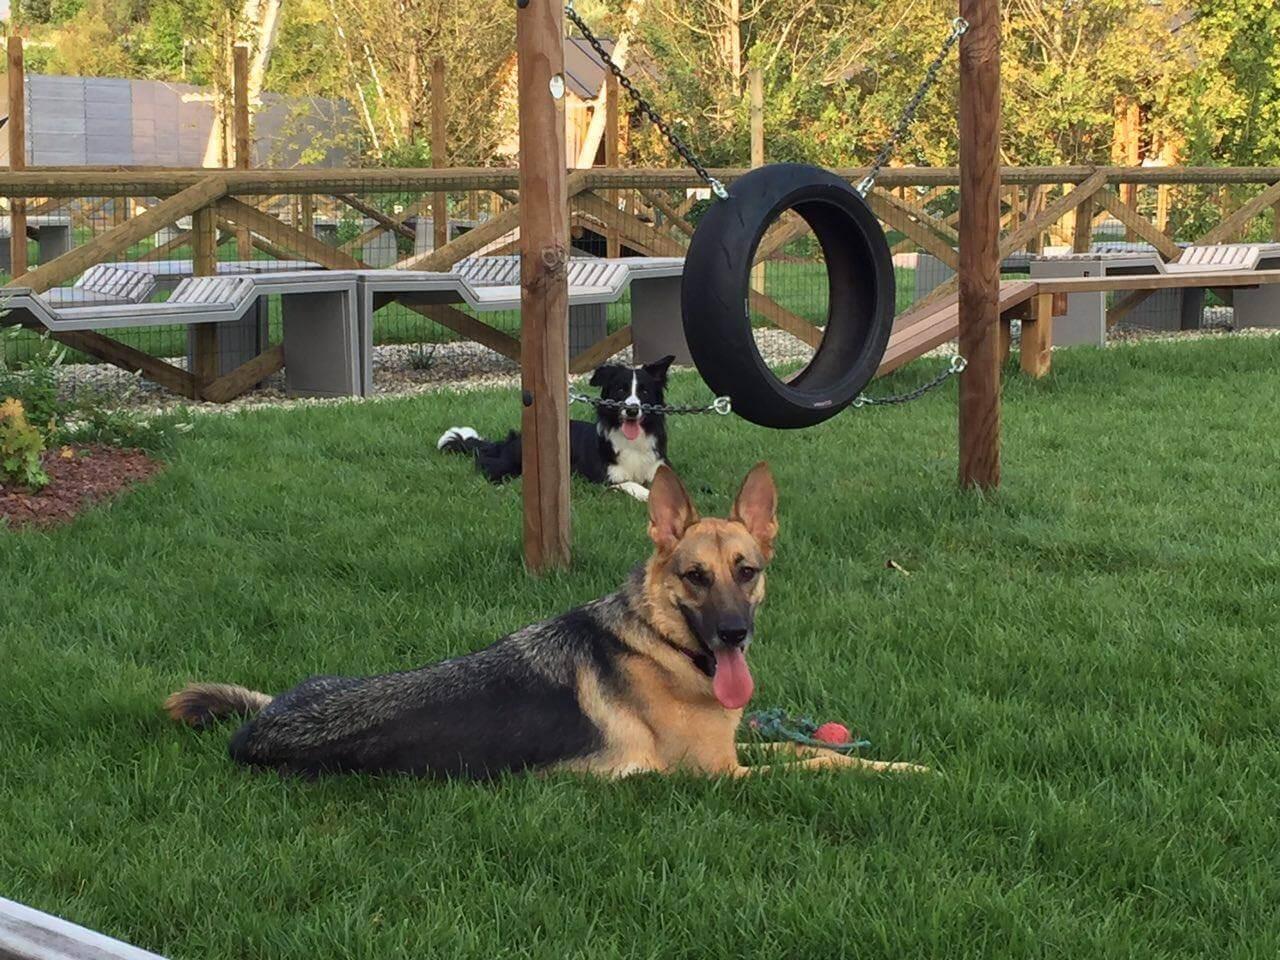 Siracusa, una dog area in piazza Adda: lunedì la presentazione